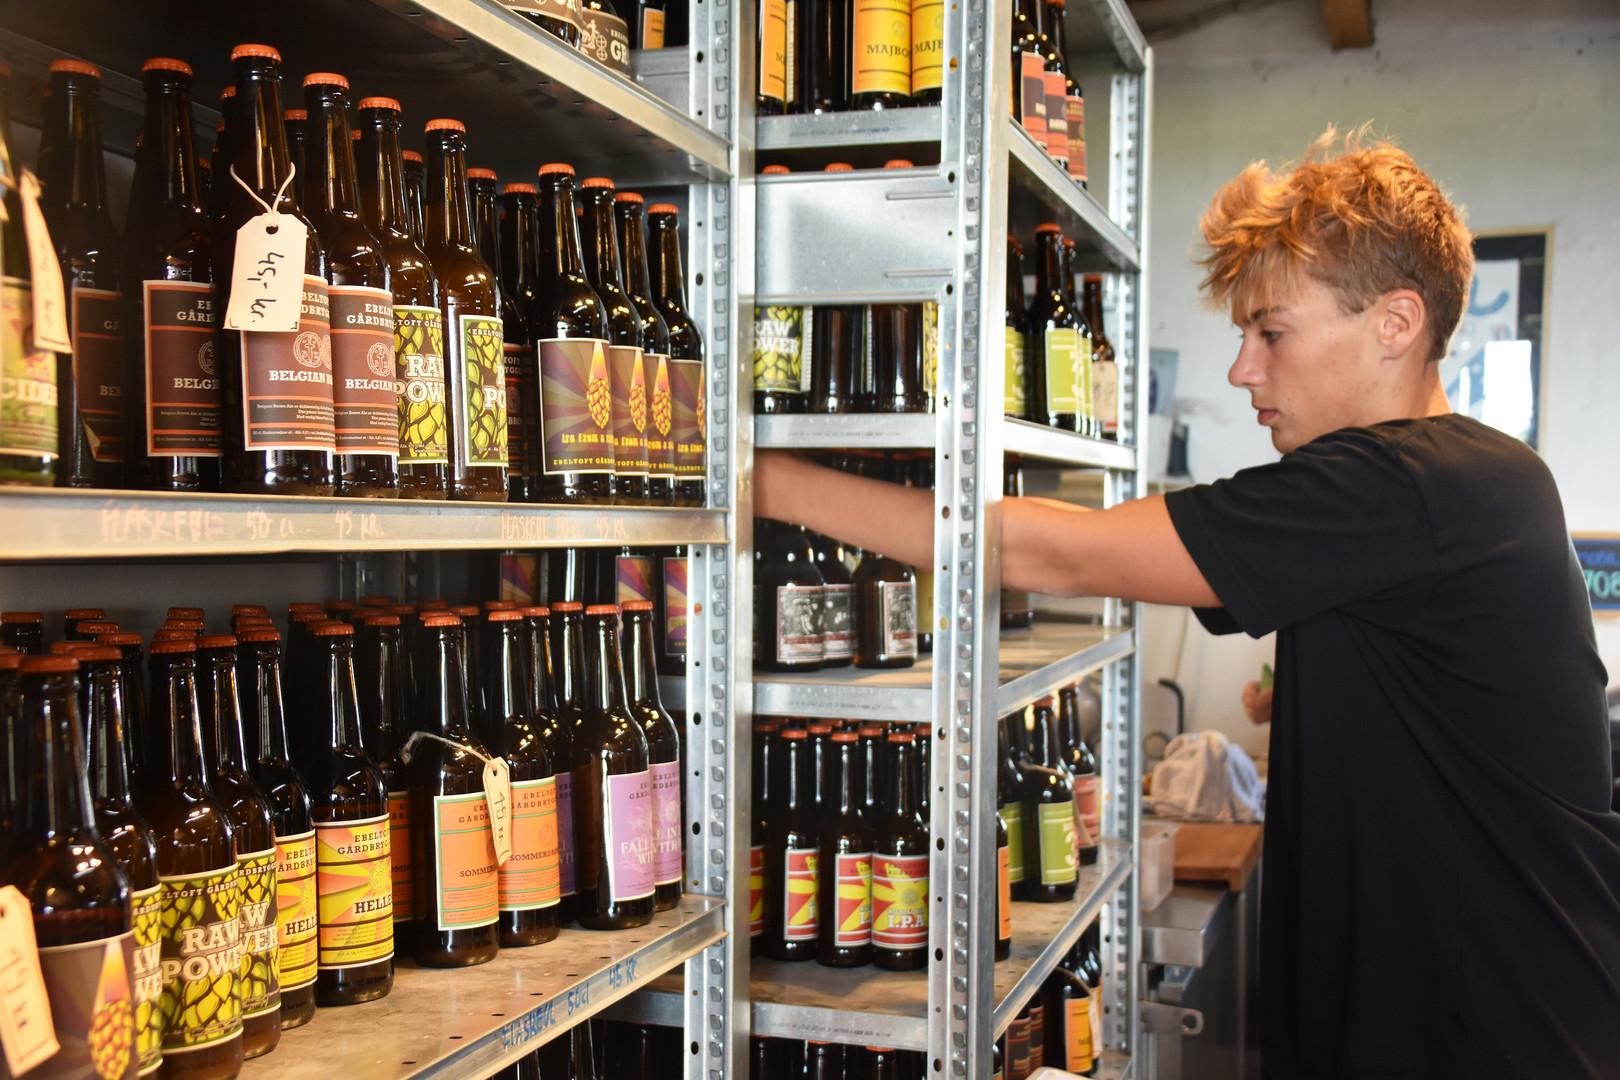 Ebeltoft Gaardbryggeri - local brewery in Djursland